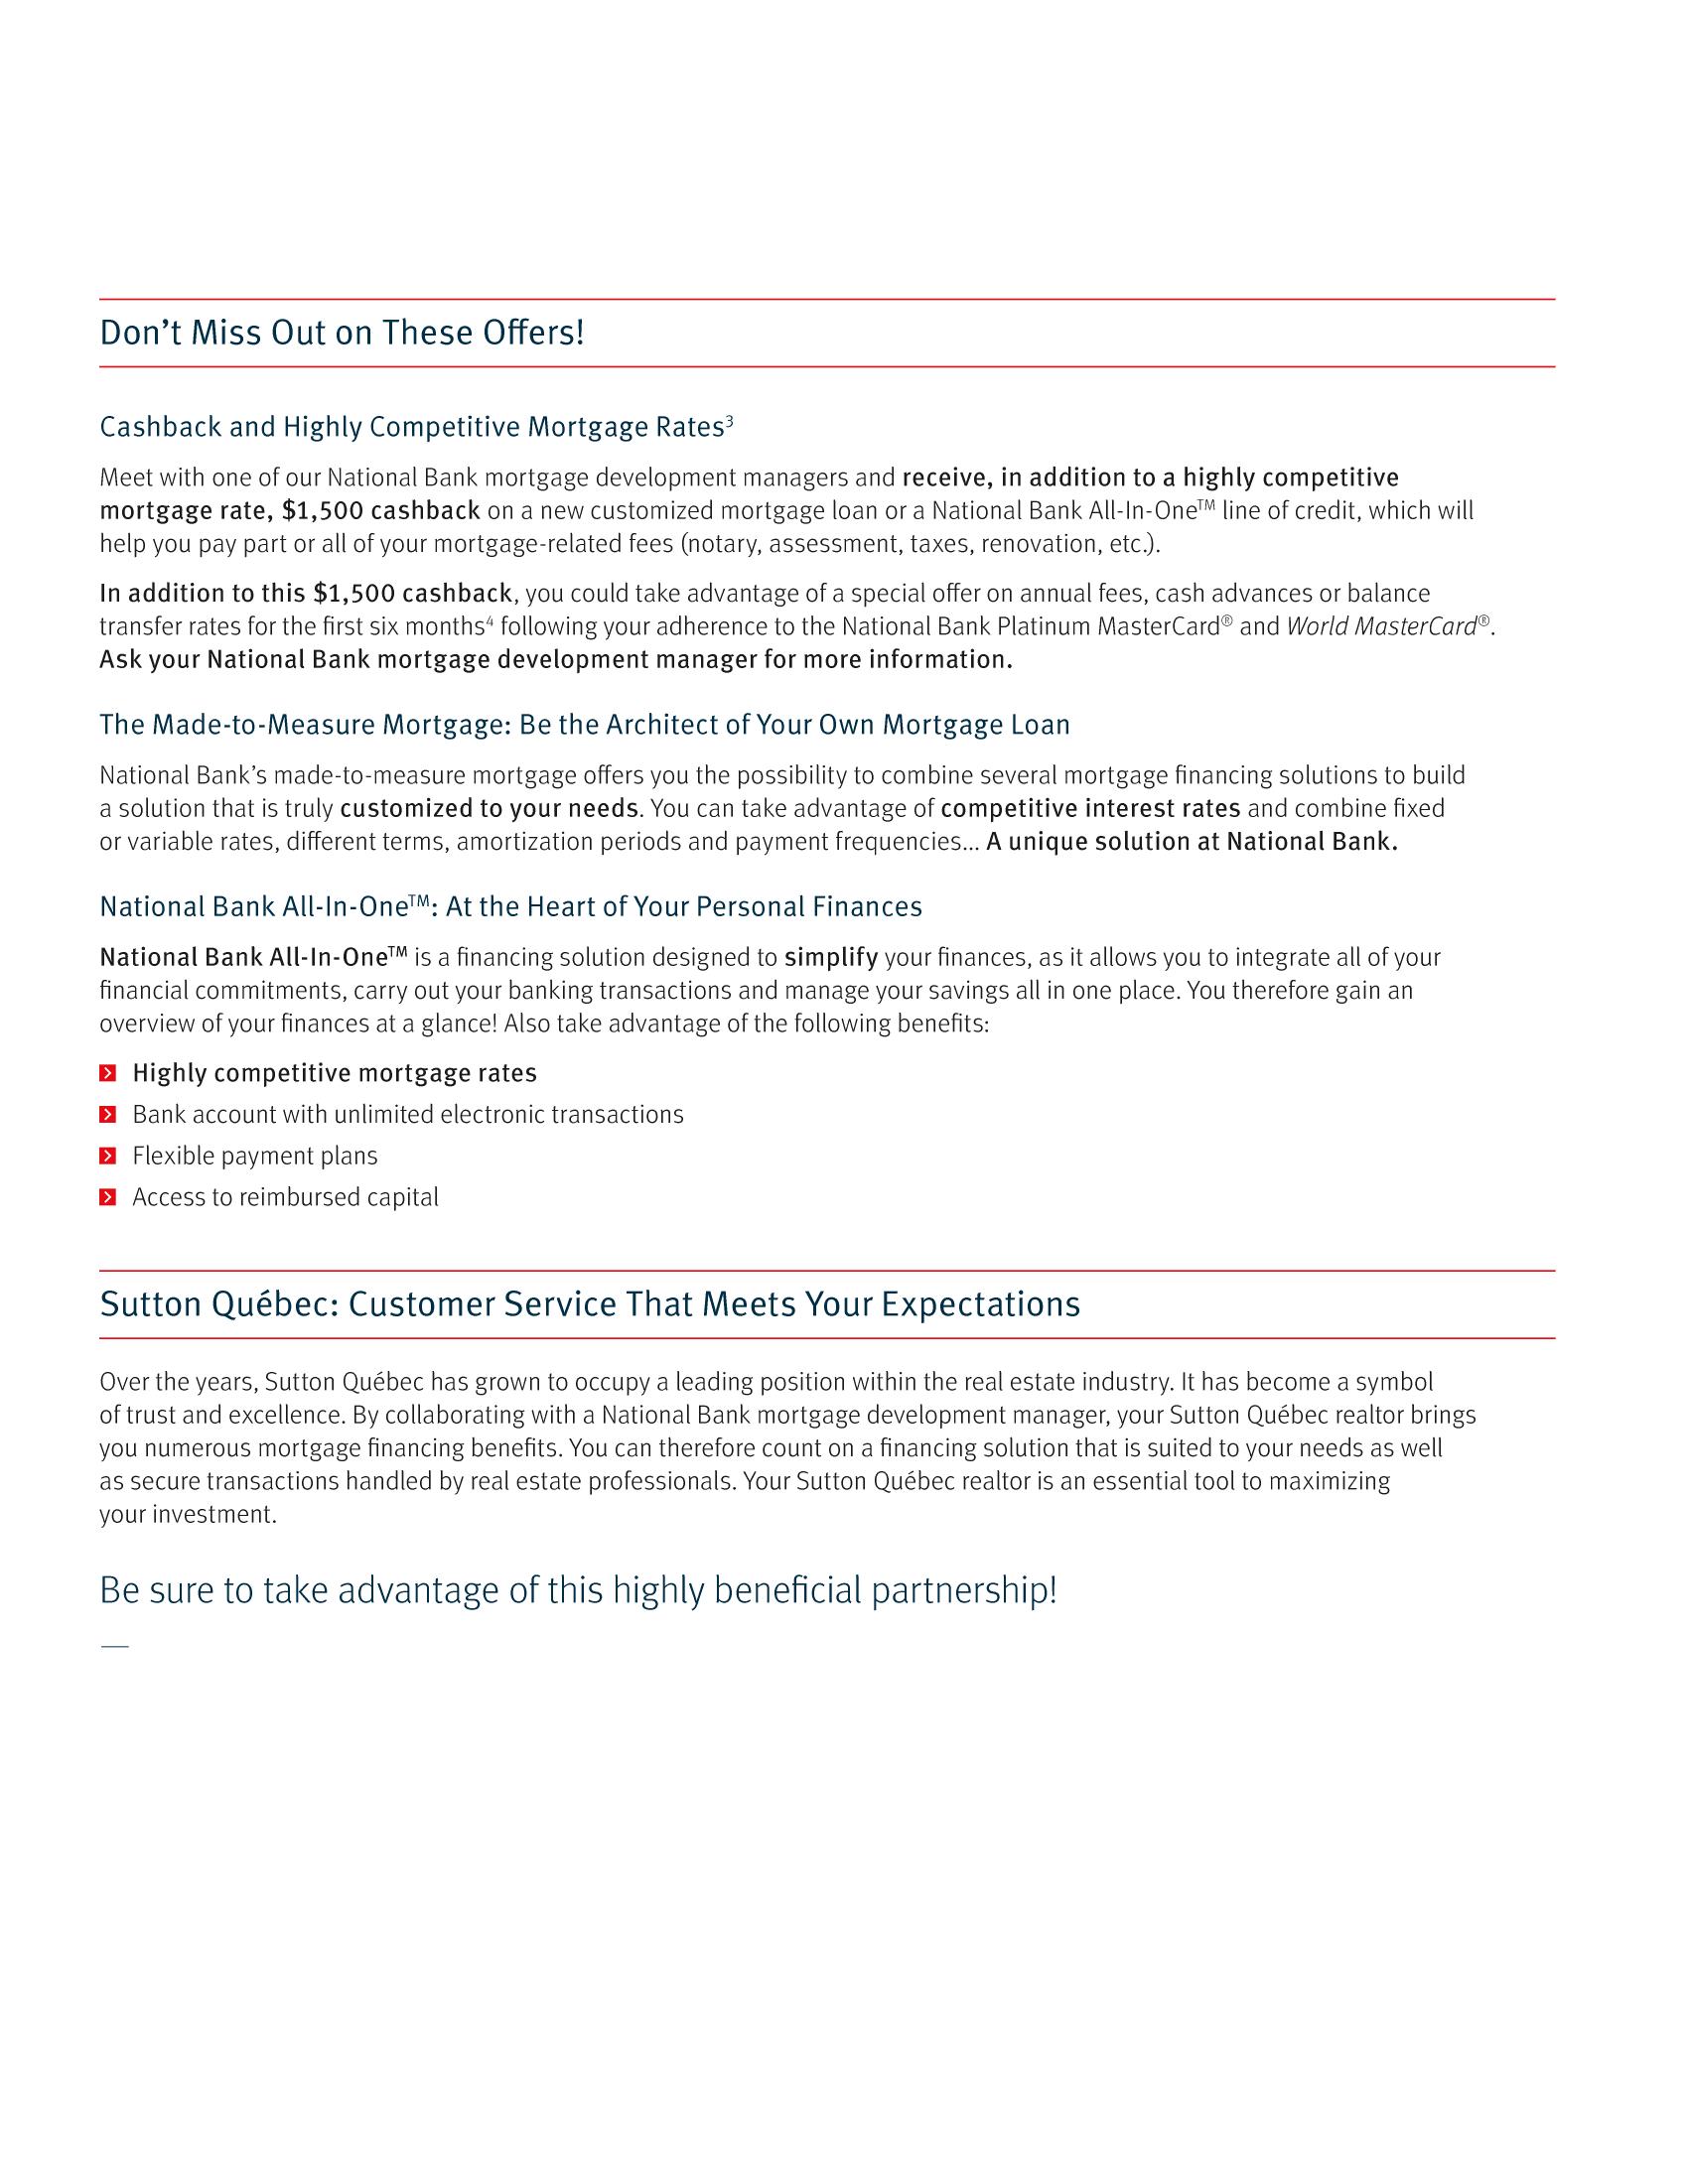 "3   Leaflet ""A Partnership with a Wealth of Advantages"" - Sutton"